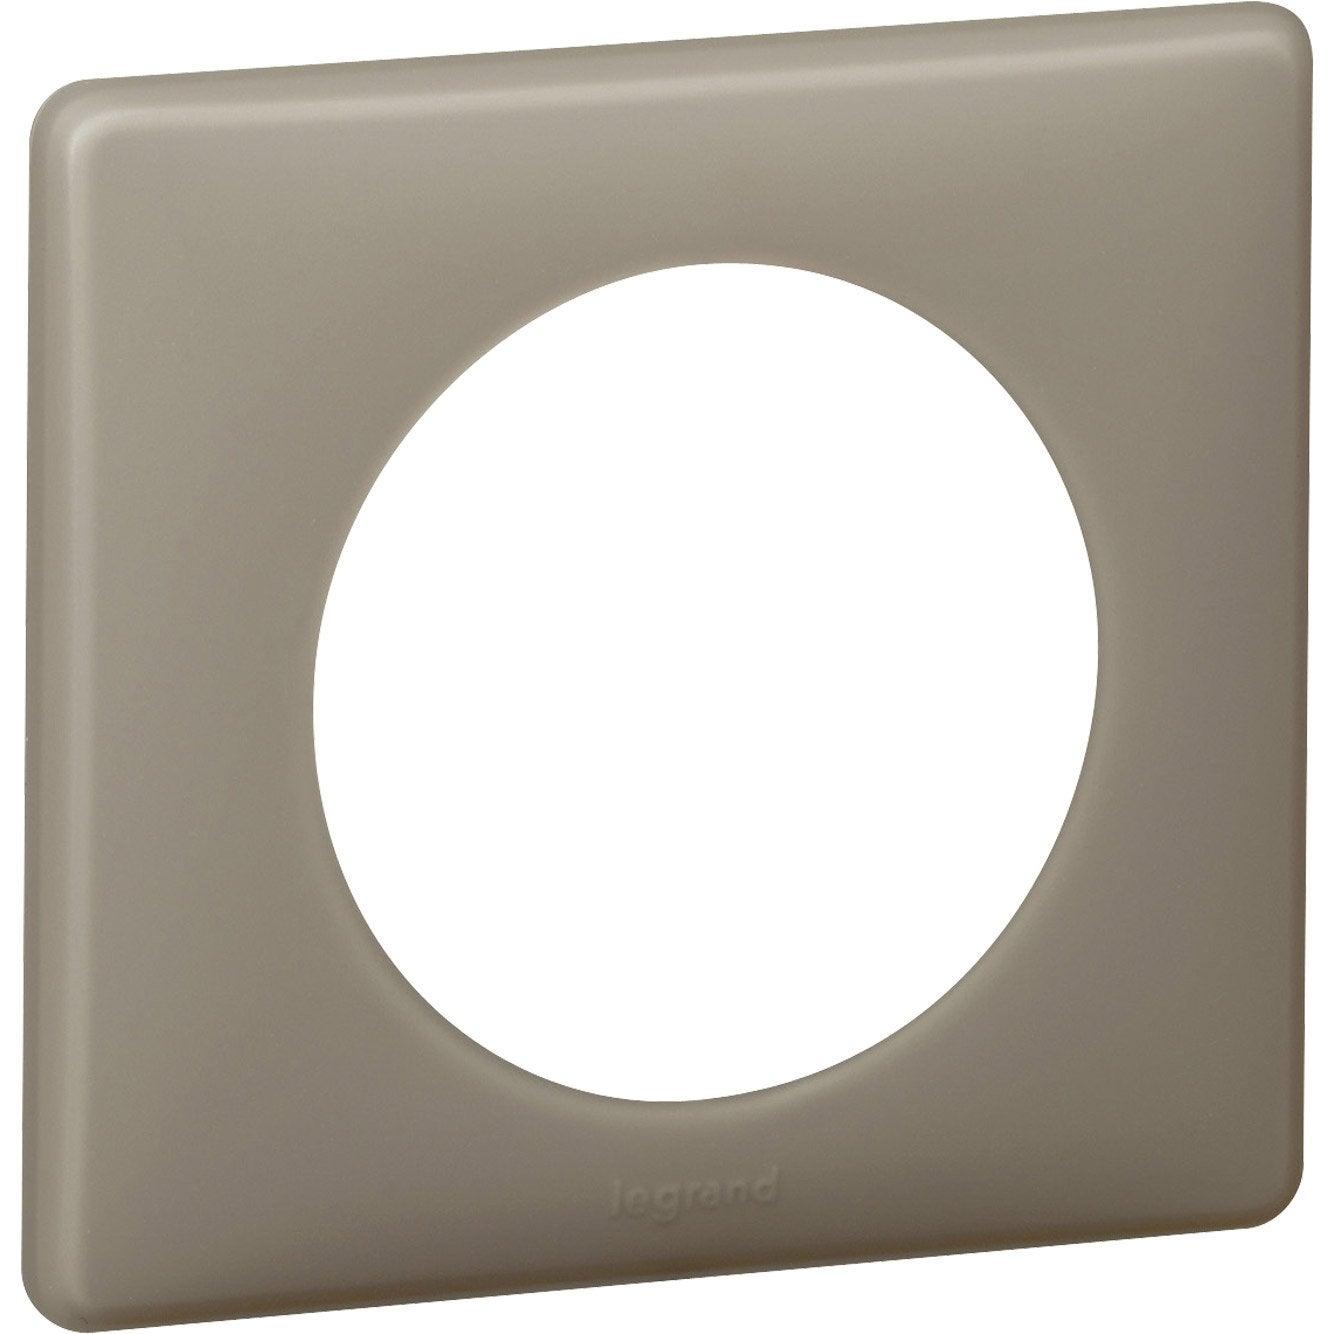 Plaque simple c liane legrand gr s leroy merlin - Leve plaque leroy merlin ...